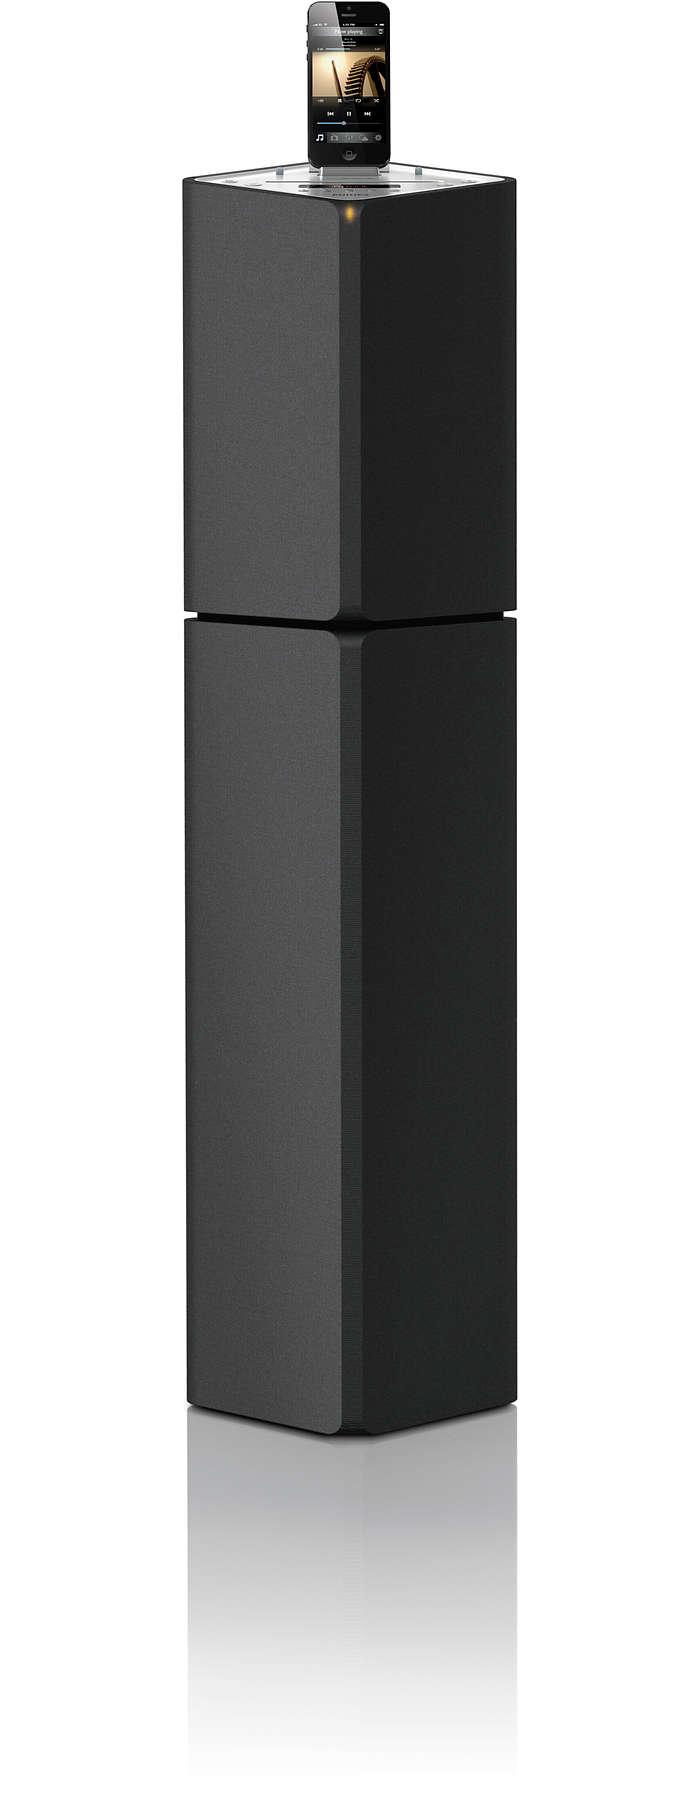 mini stereoanlage dcm3175 12 philips. Black Bedroom Furniture Sets. Home Design Ideas